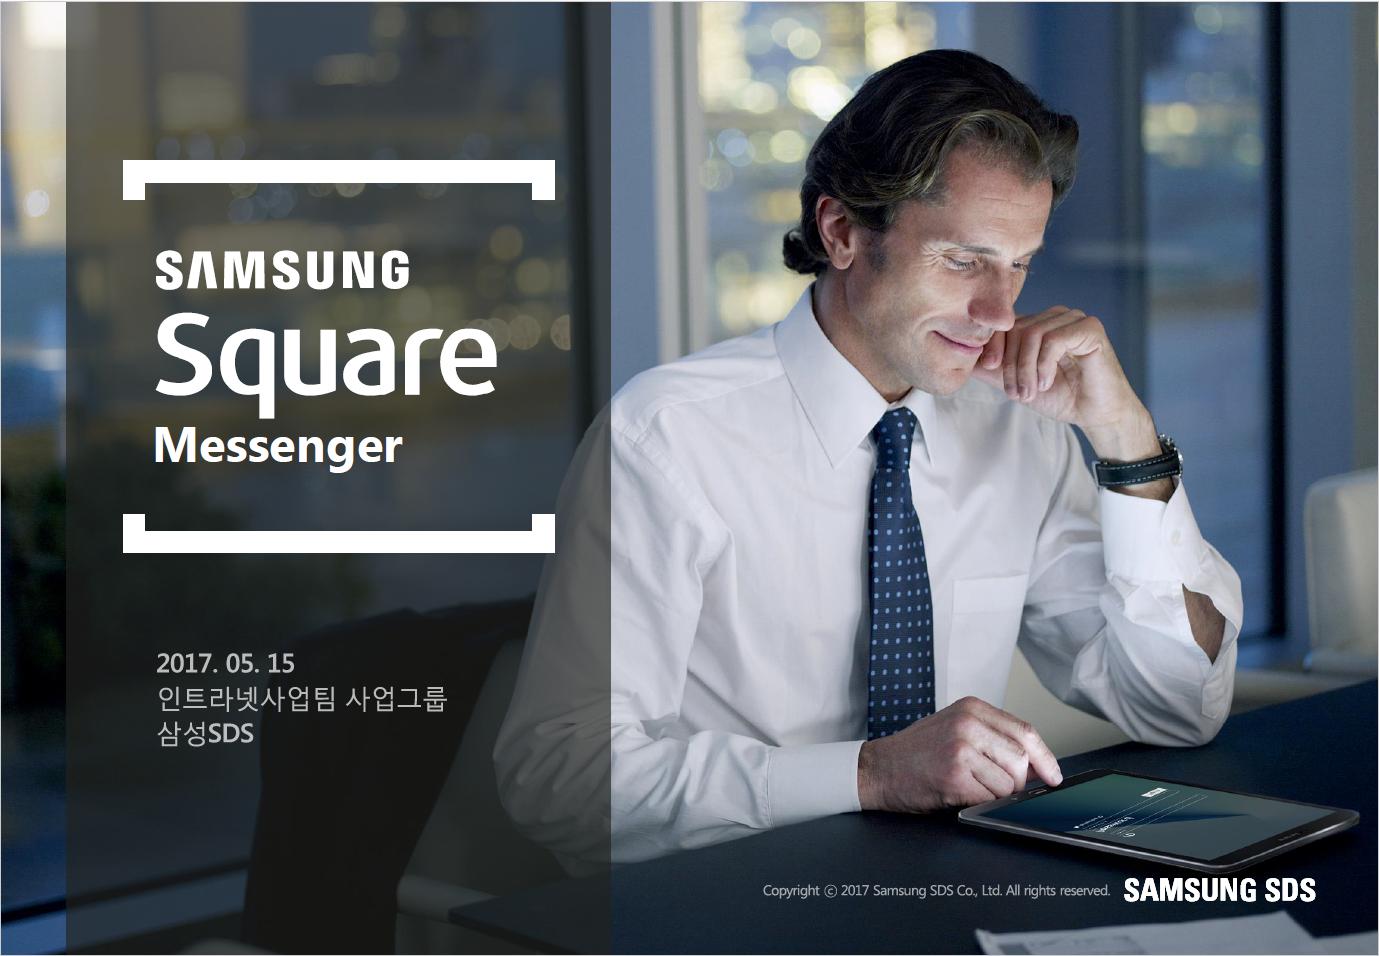 Square Messenger가 프로젝트 수행을 지원합니다